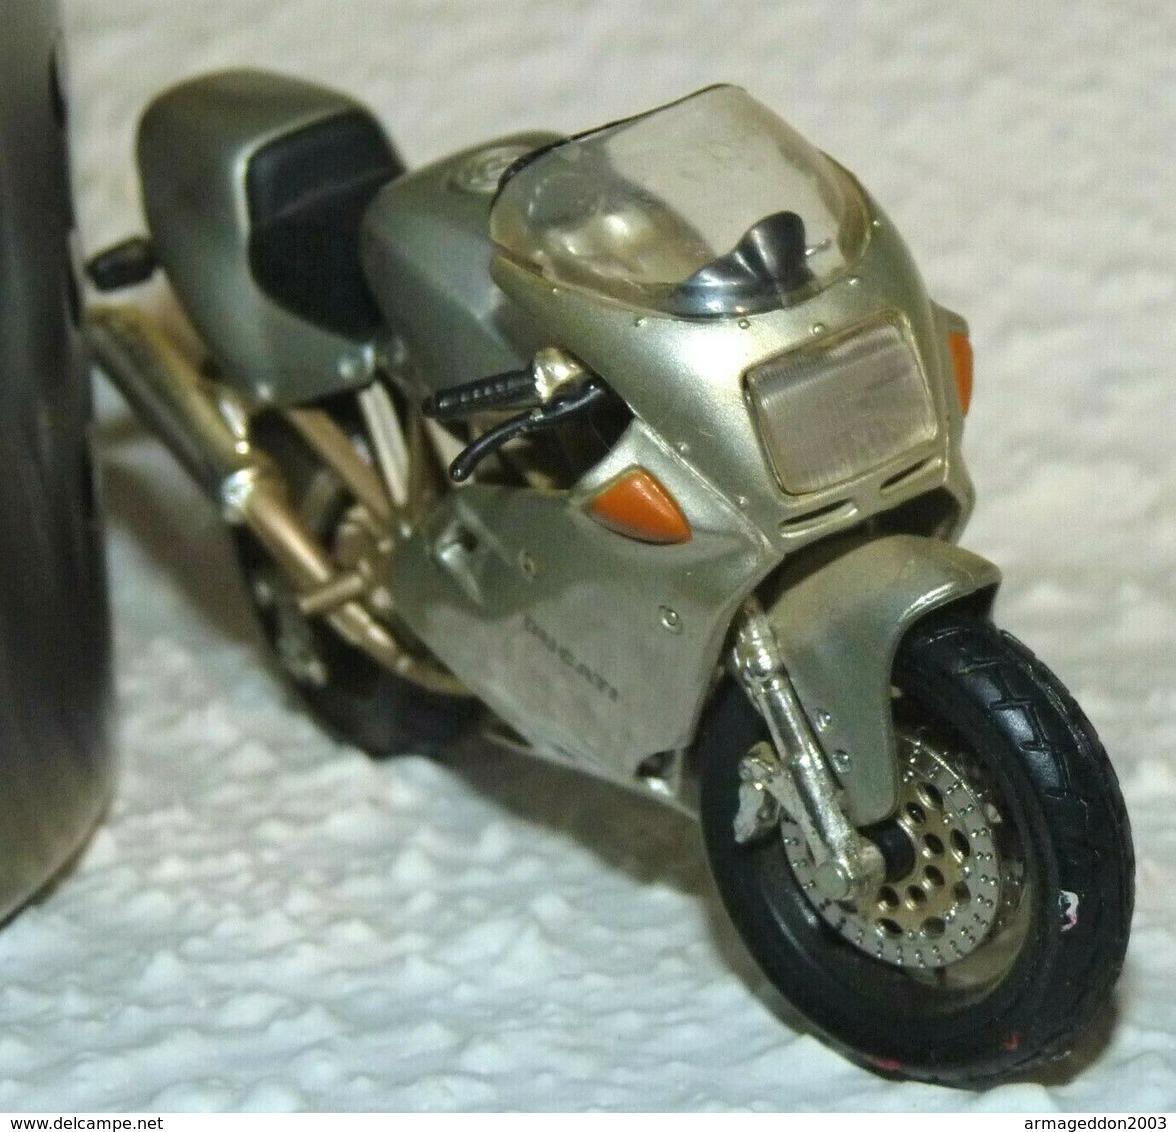 MAISTO MOTO 1/18 DUCATI SUPERSPORT 900 FE Be Mais Manque La Bequille - Motos